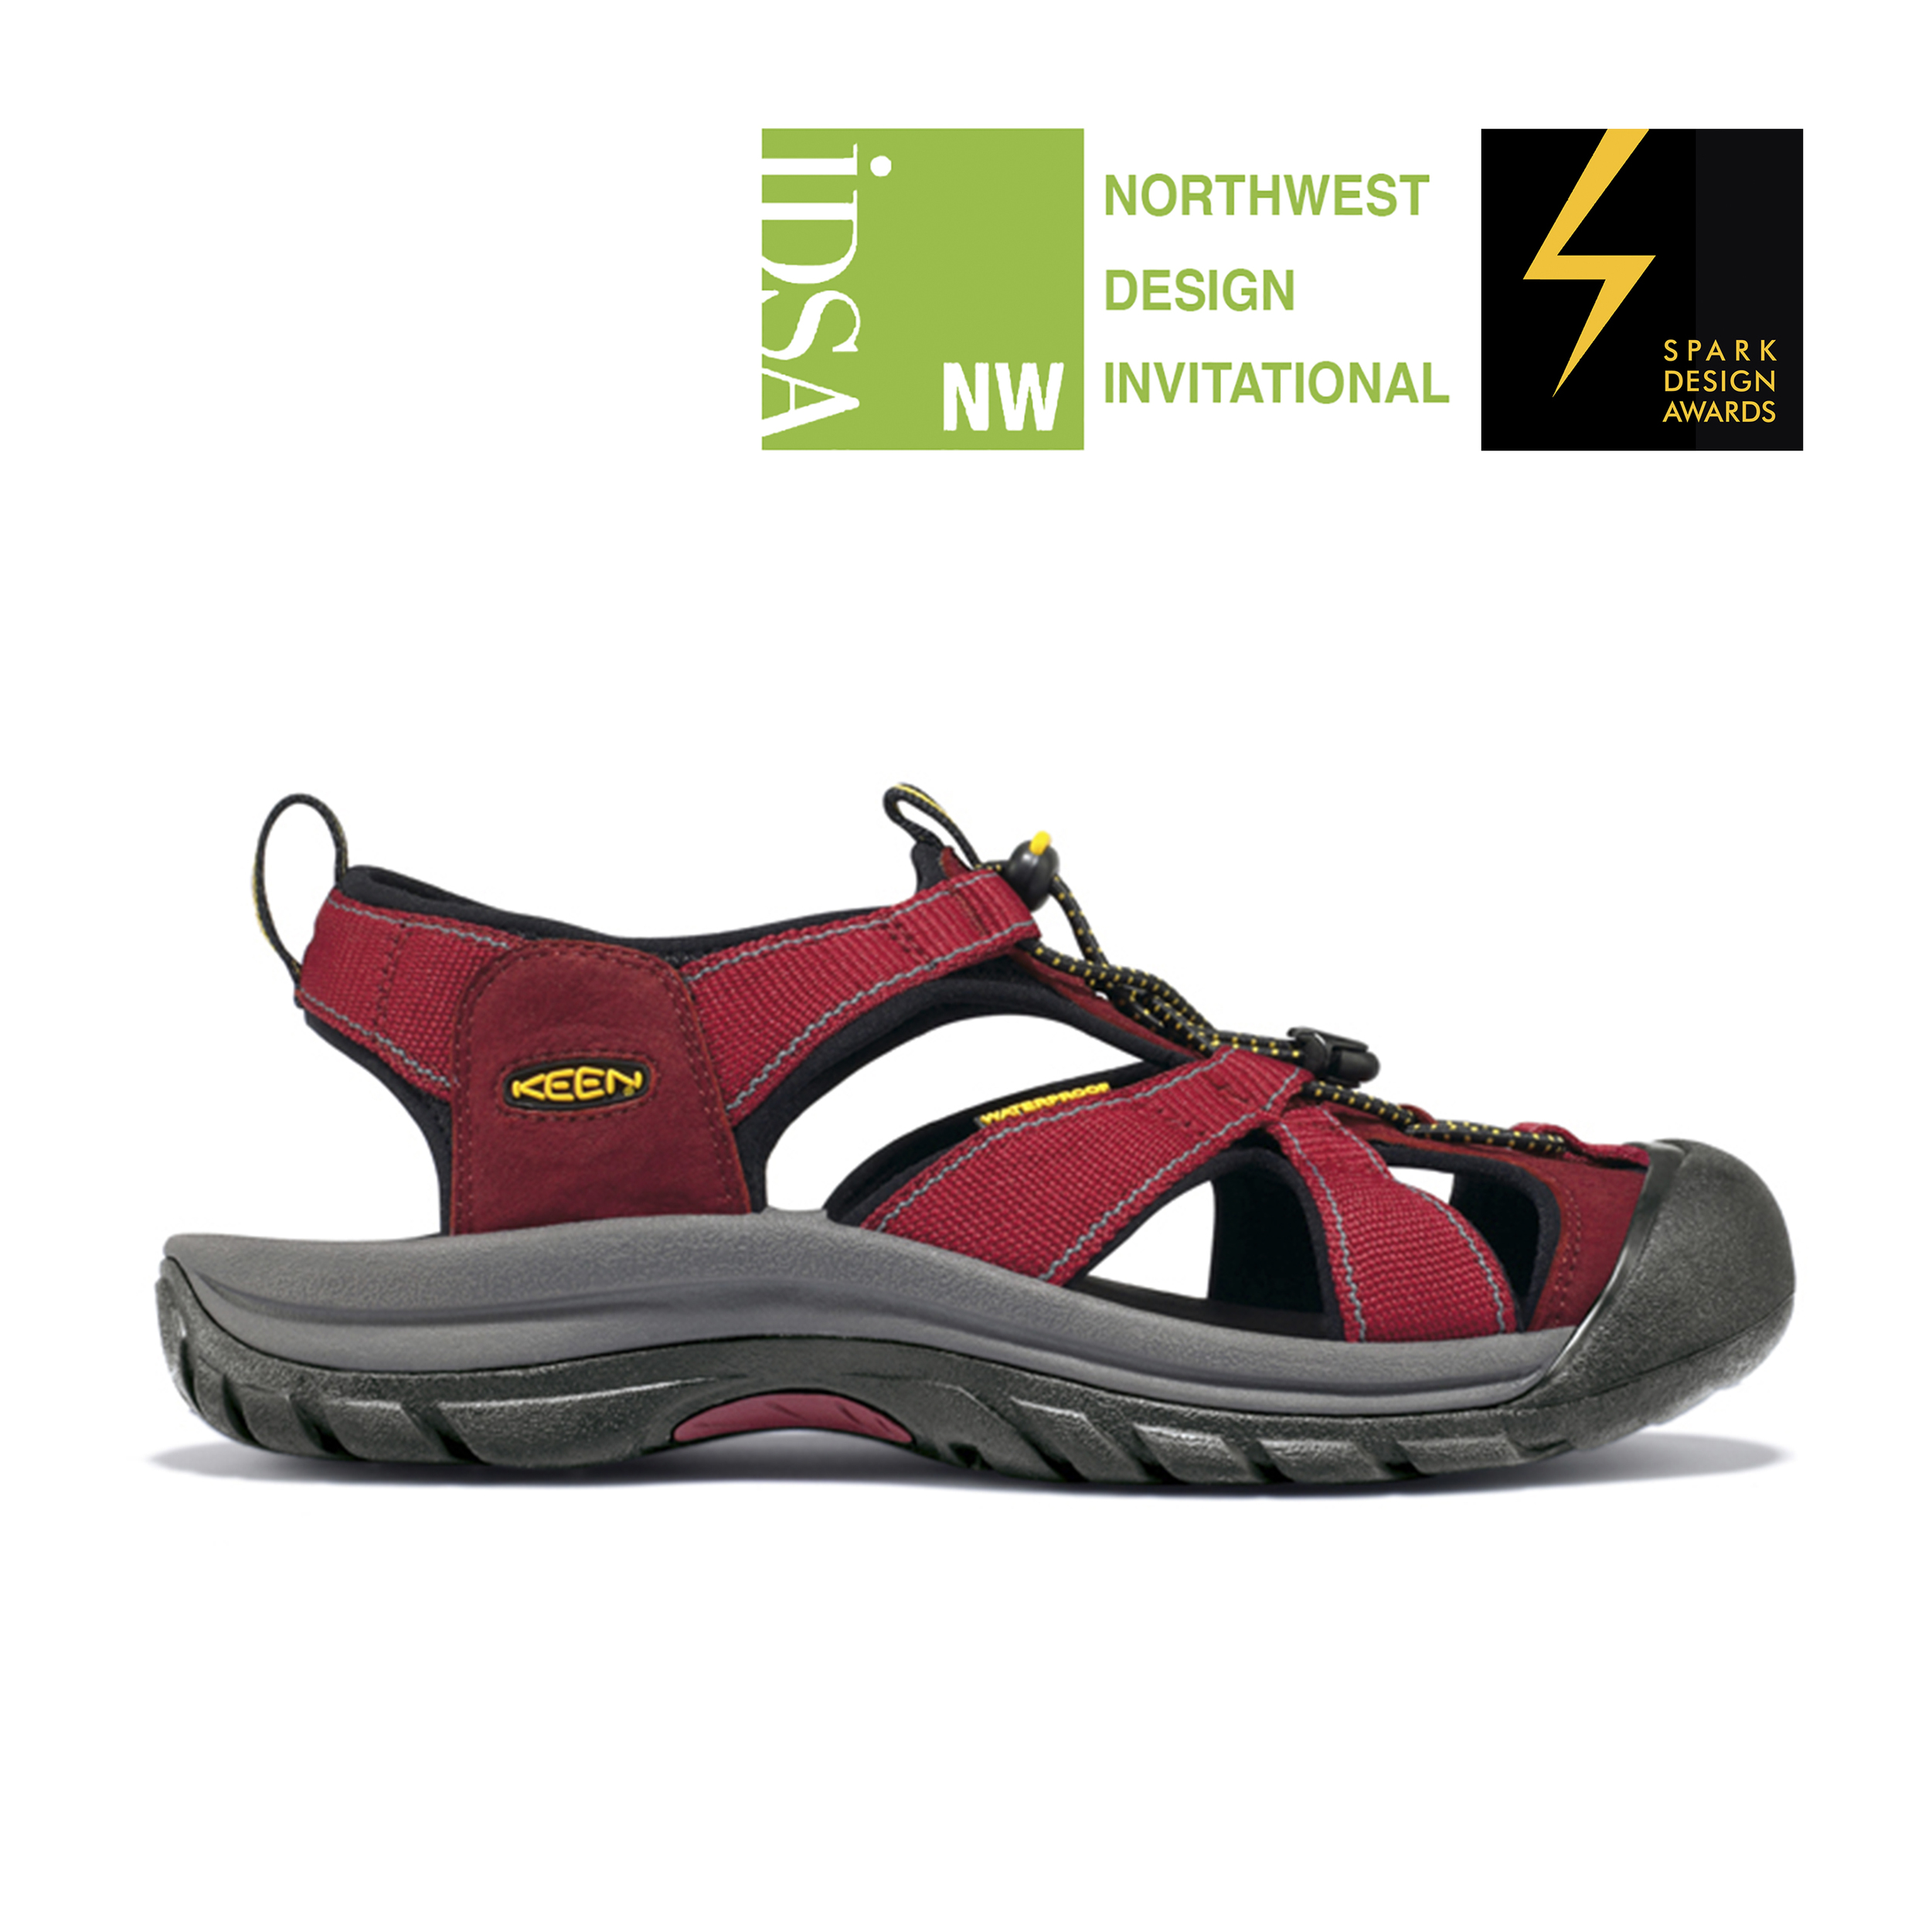 Keen Venice Hybrid Sandal   IDSA Northwest Design Invitational Spark Awards